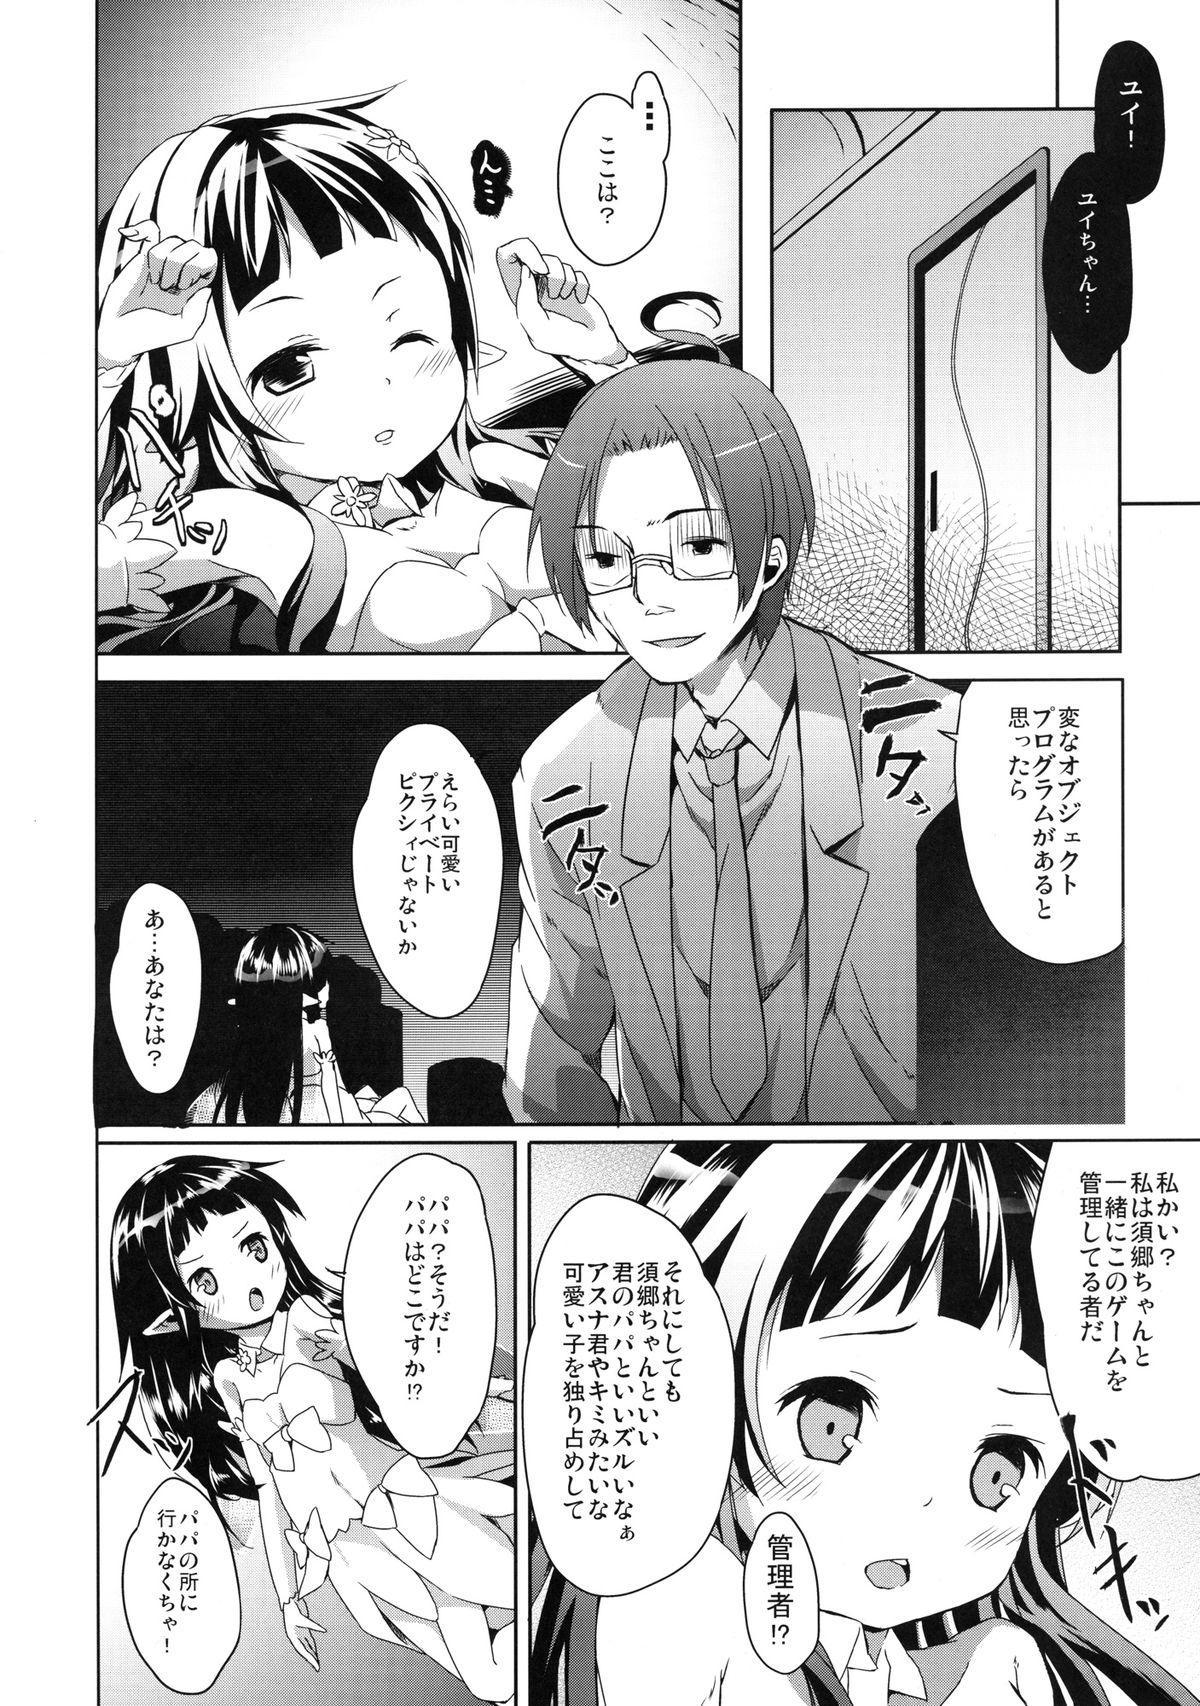 Yui-chan BOKOO! 3